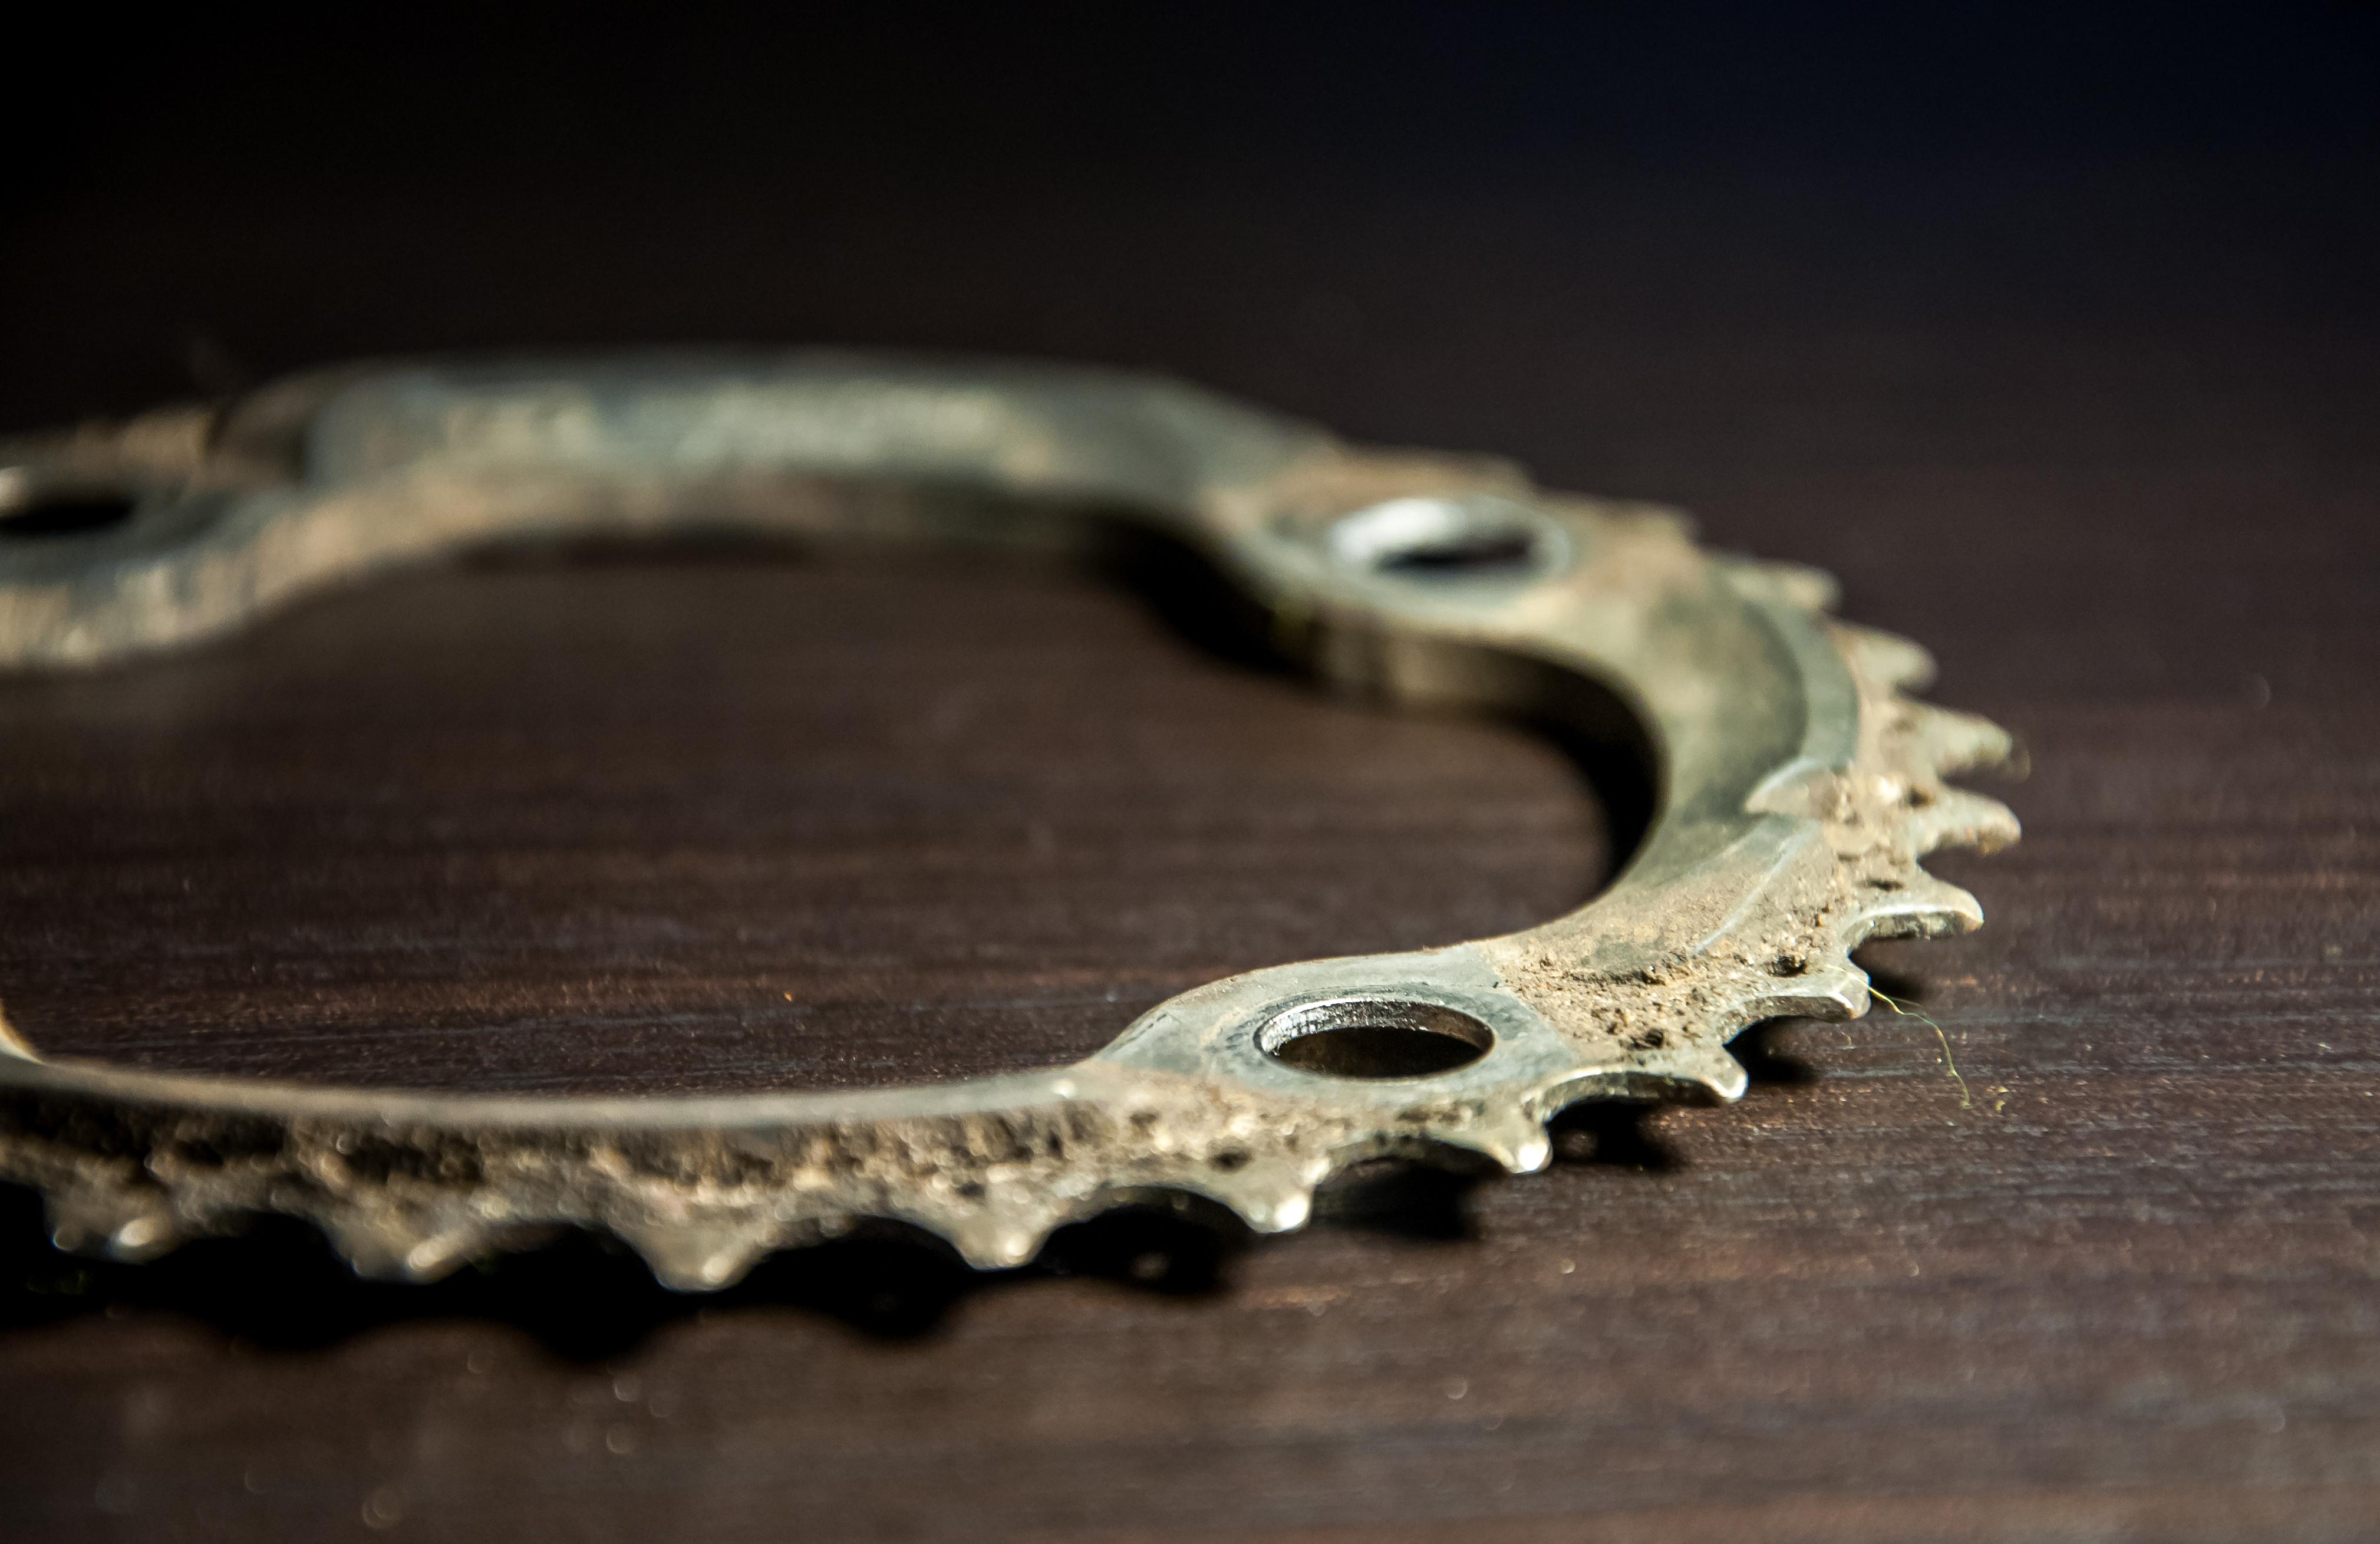 Bicycle parts, chainring, Bicycle, Metal, Vehicle, Teeth, HQ Photo